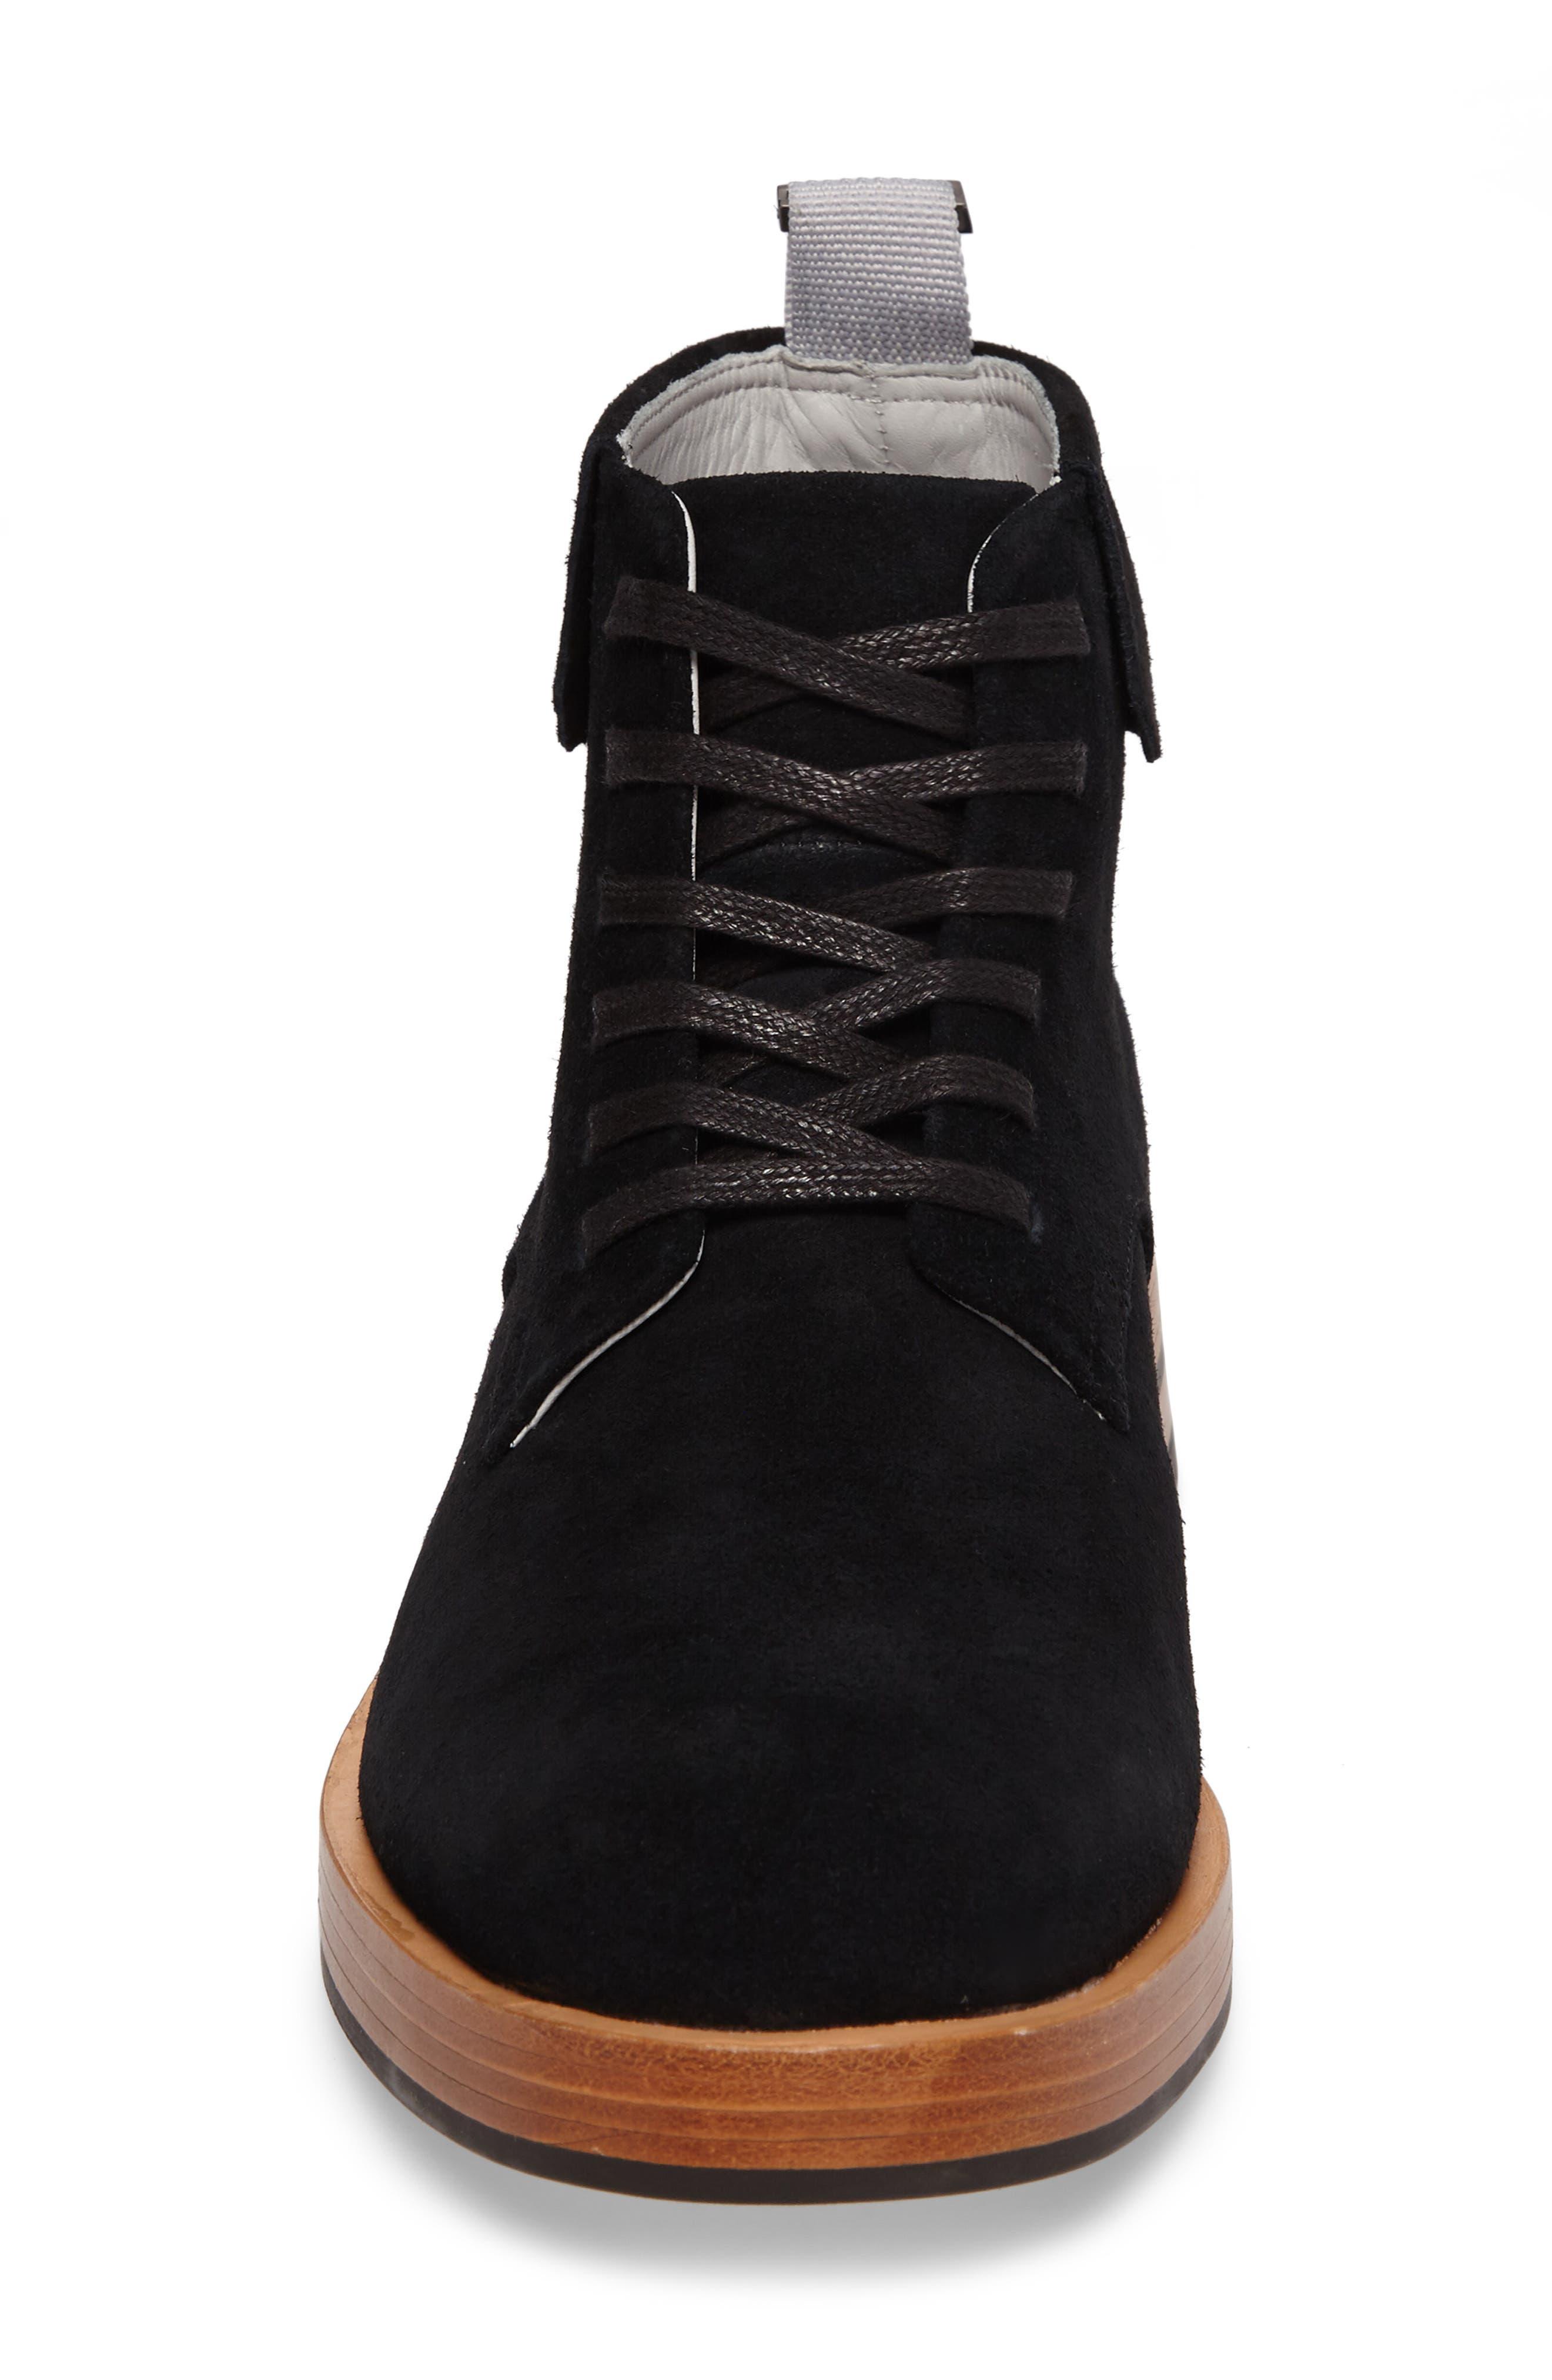 Radburn Plain Toe Boot,                             Alternate thumbnail 4, color,                             001